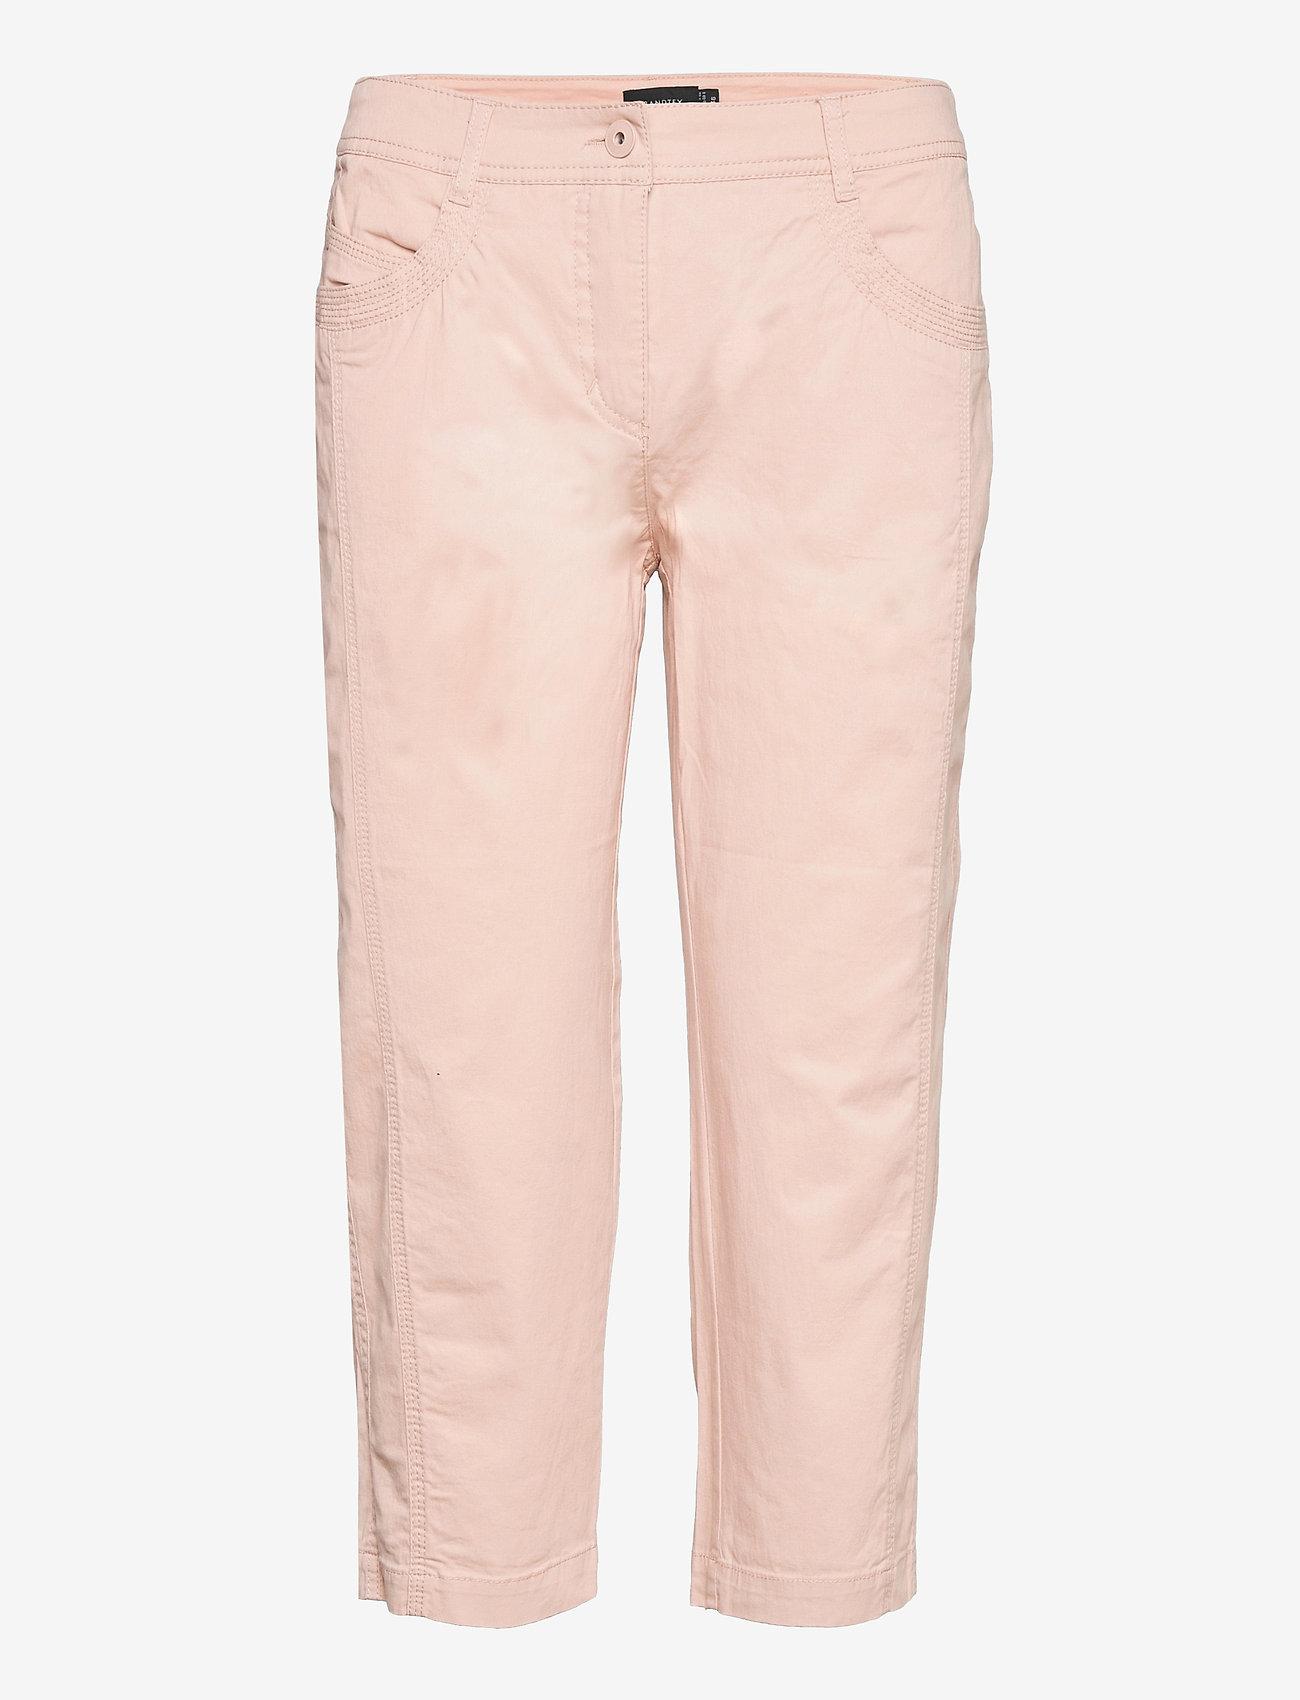 Brandtex - Capri pants - capri bukser - pale blush - 0